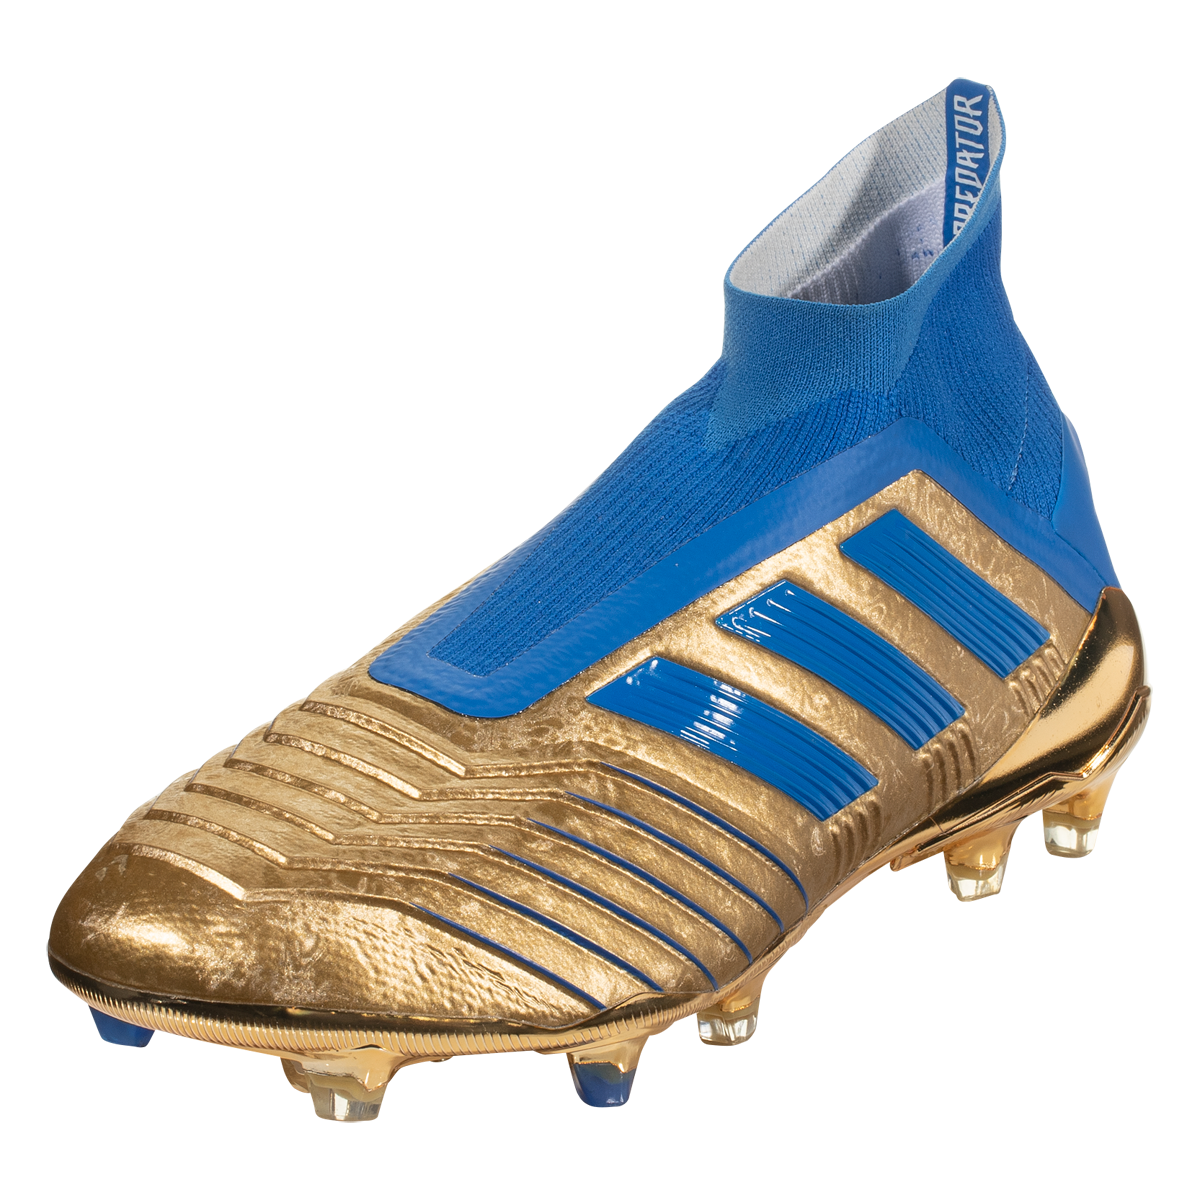 Adidas Predator 19 Fg Soccer Cleat Metallic Gold Blue White 12 5 Soccer Cleats Adidas Predator Nike Football Boots